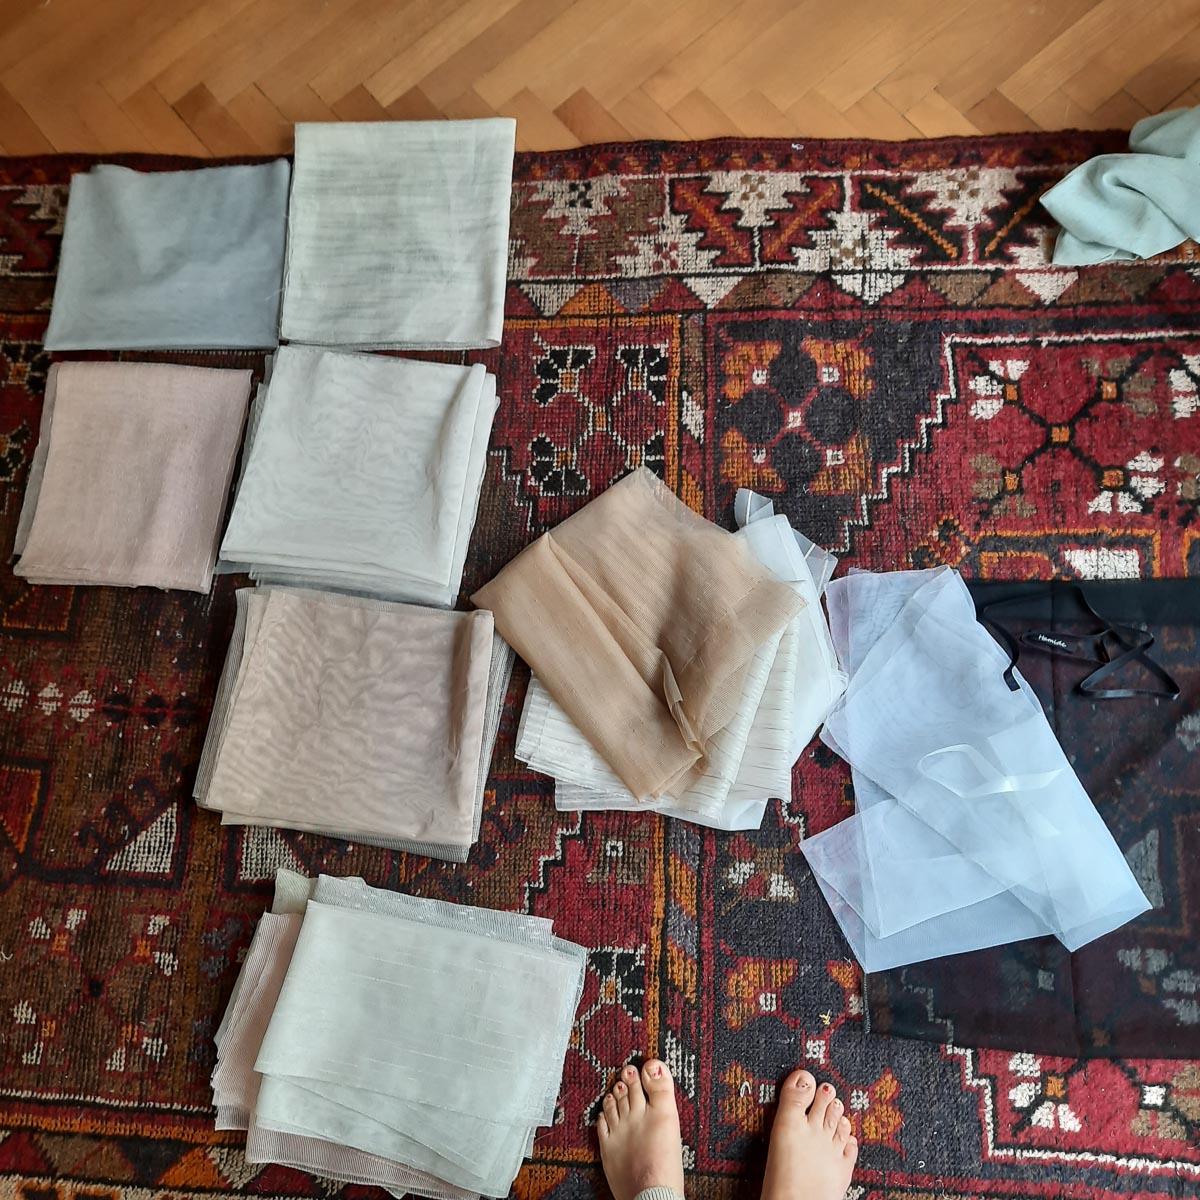 Fabric sorting process of Hamide Originals Tulle Sacs